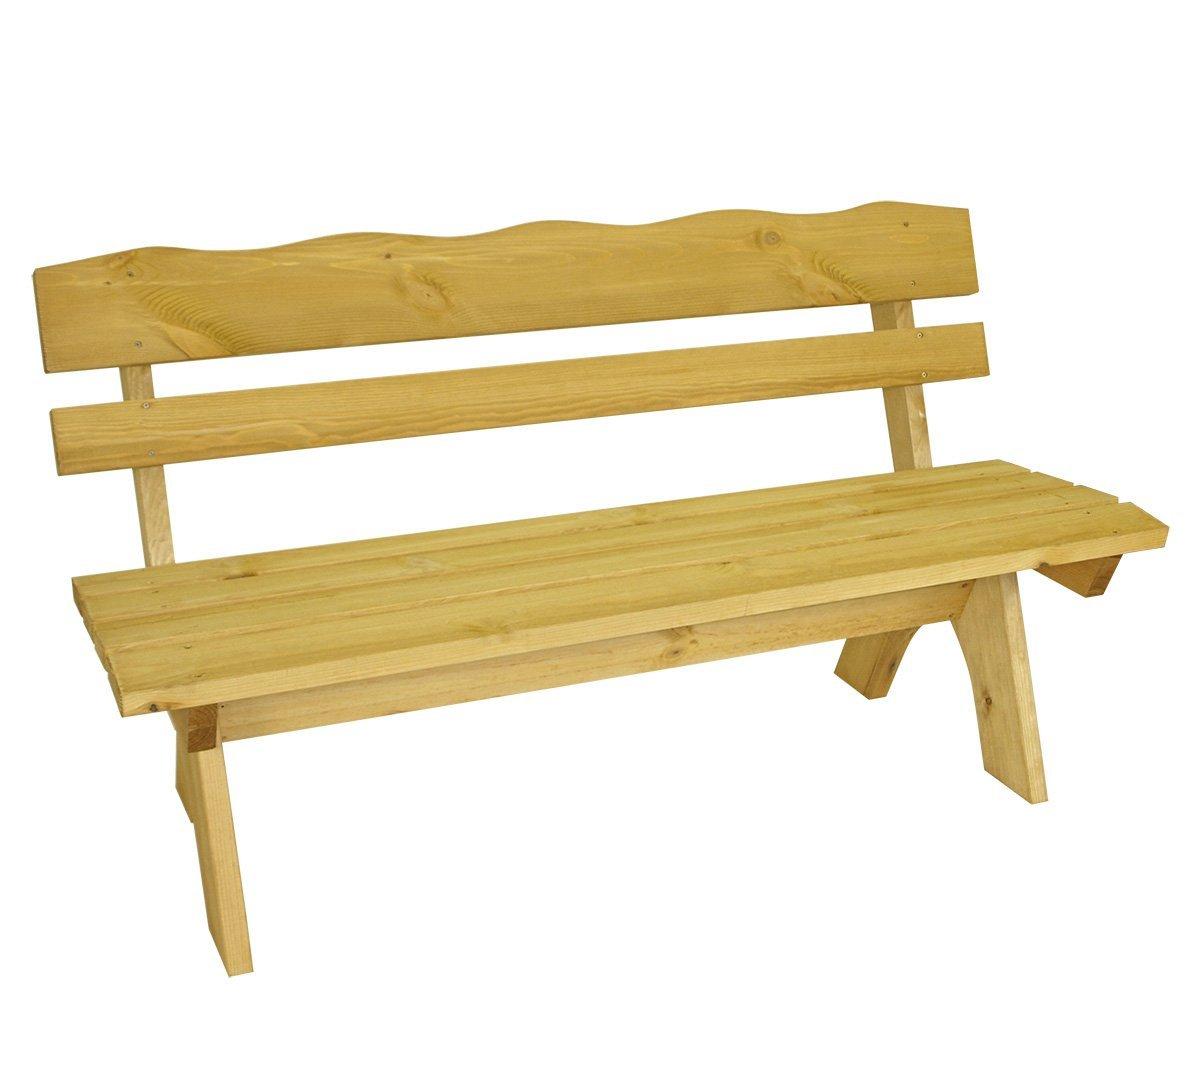 Gartenbank Massiv Holz Freital Kiefer 150 Cm